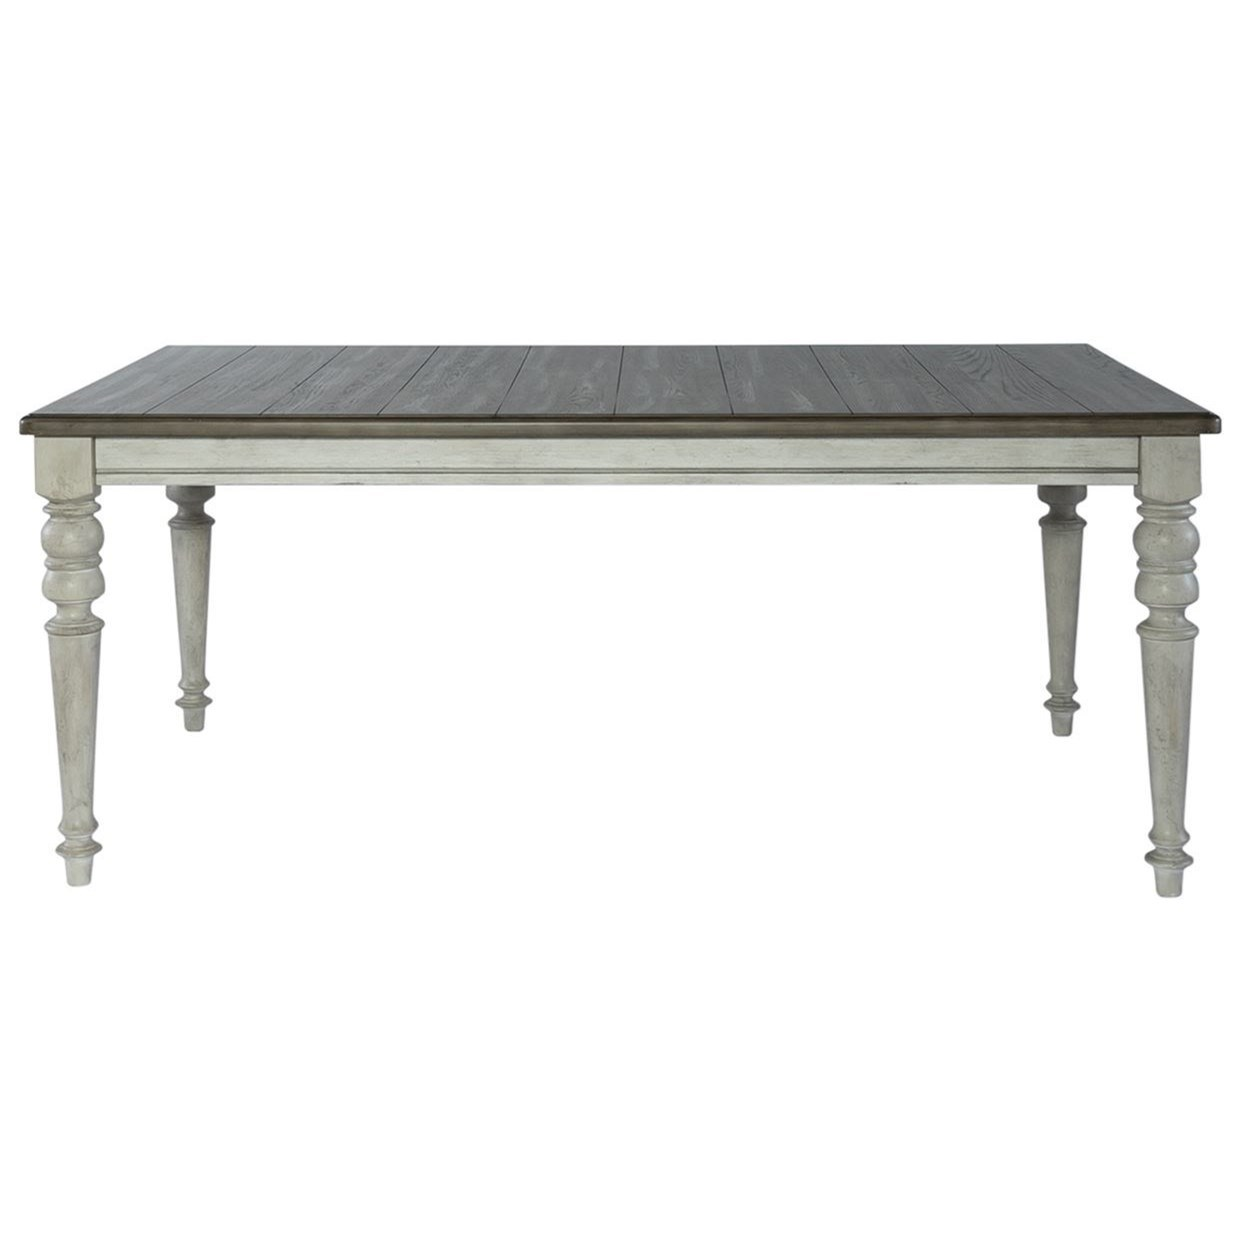 Cottage Lane Rectangular Leg Table by Libby at Walker's Furniture